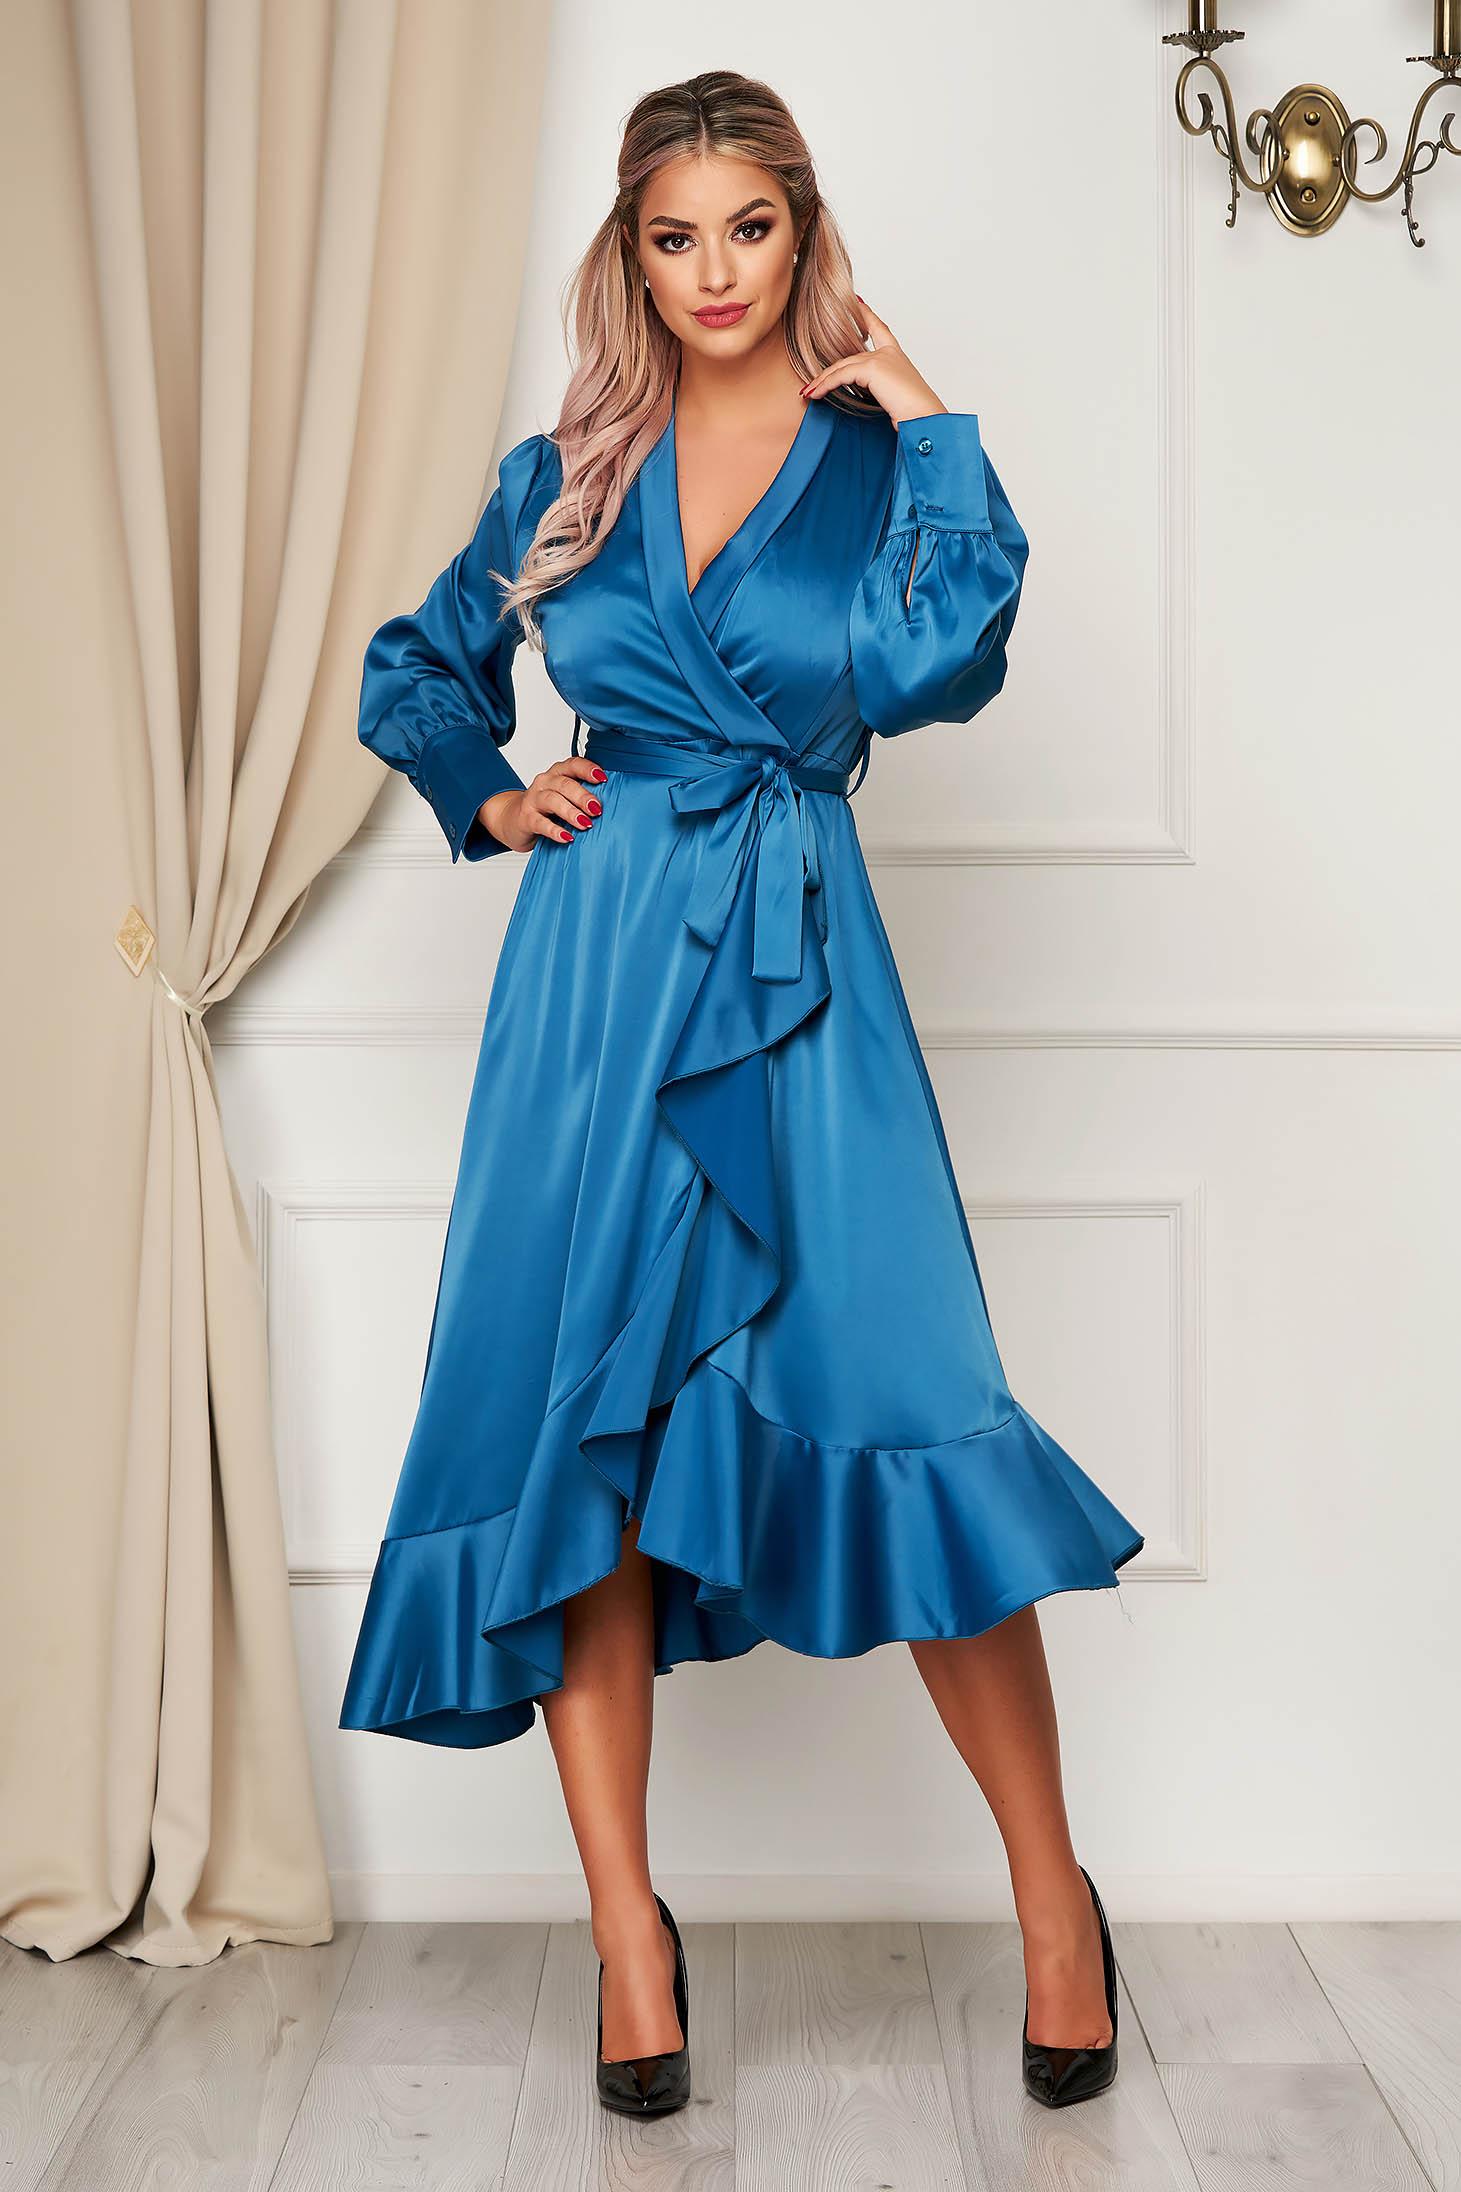 Rochie SunShine turcoaz eleganta in clos decolteu petrecut din material satinat cu volanase la baza rochiei accesorizata cu cordon